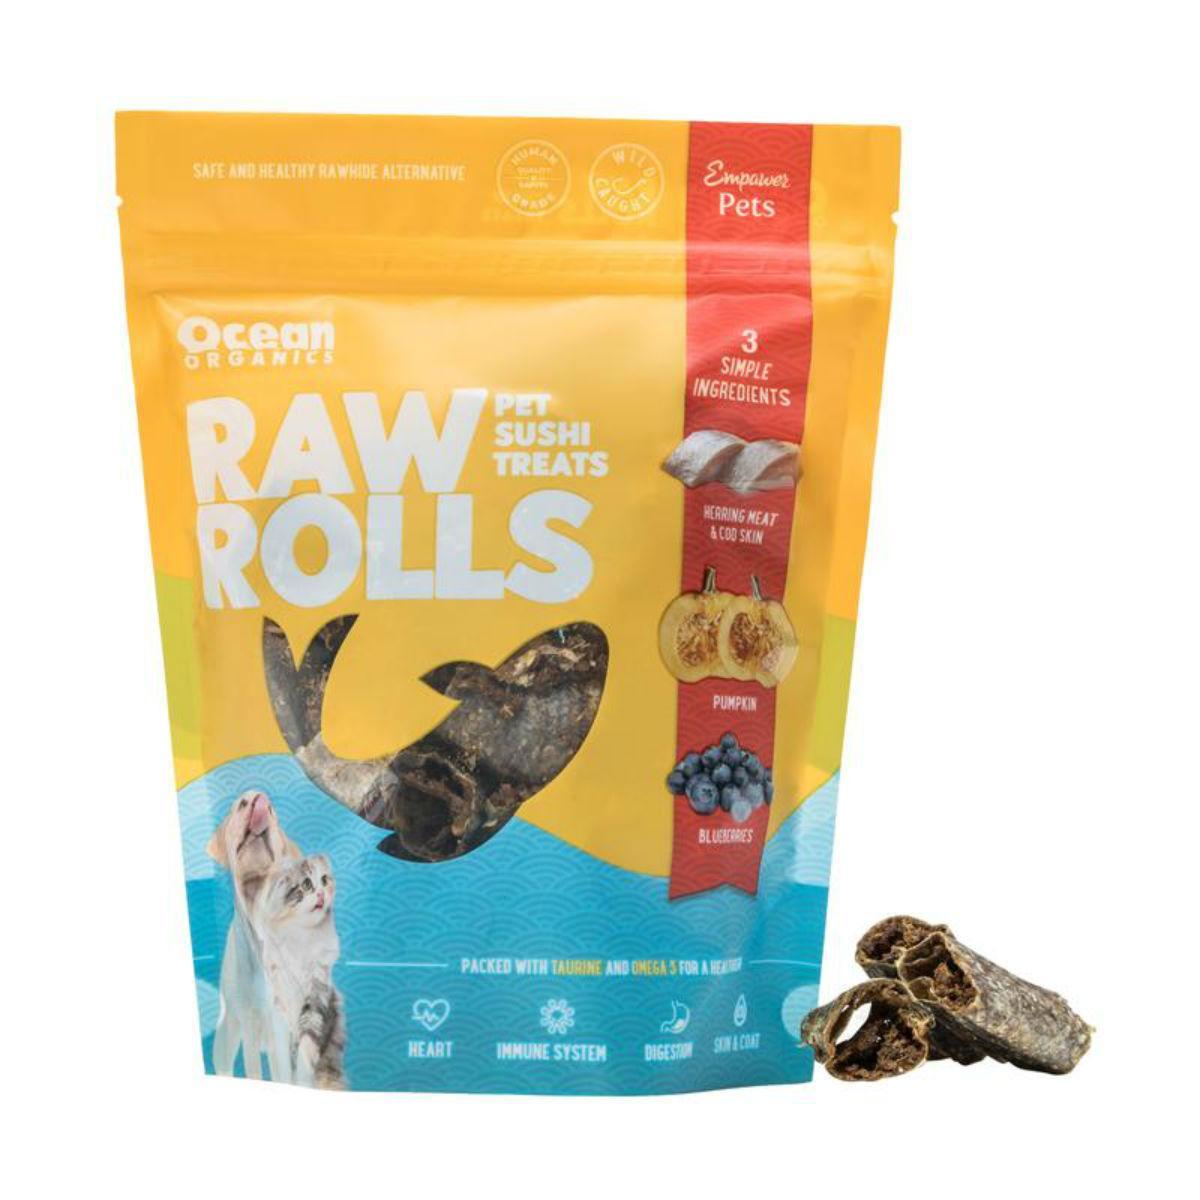 Ocean Organics Raw Rolls Sushi Pet Treats